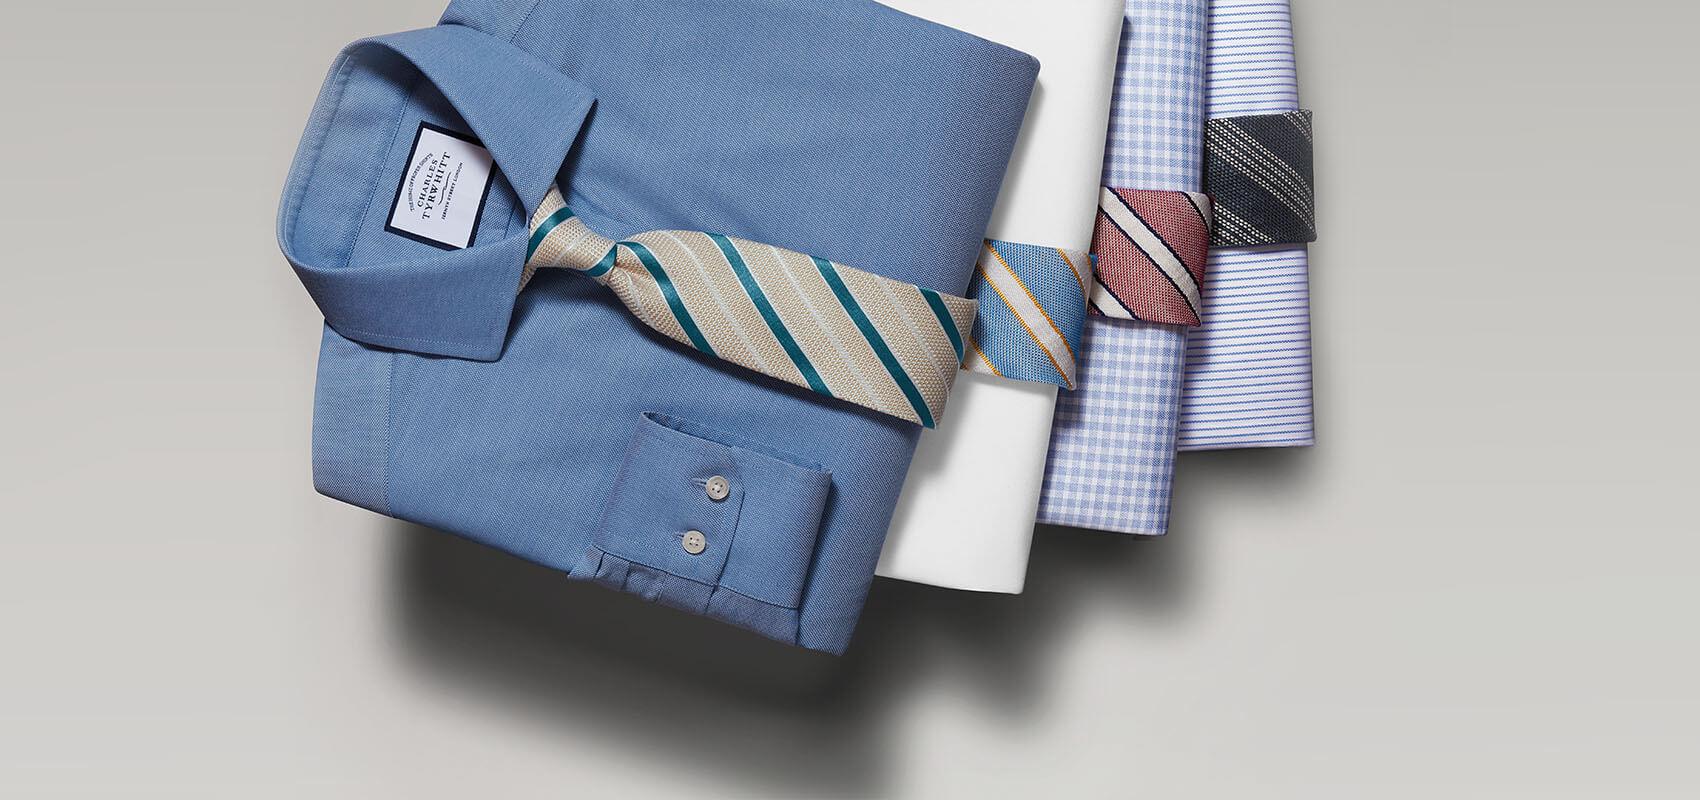 Cotton stretch Oxford shirts